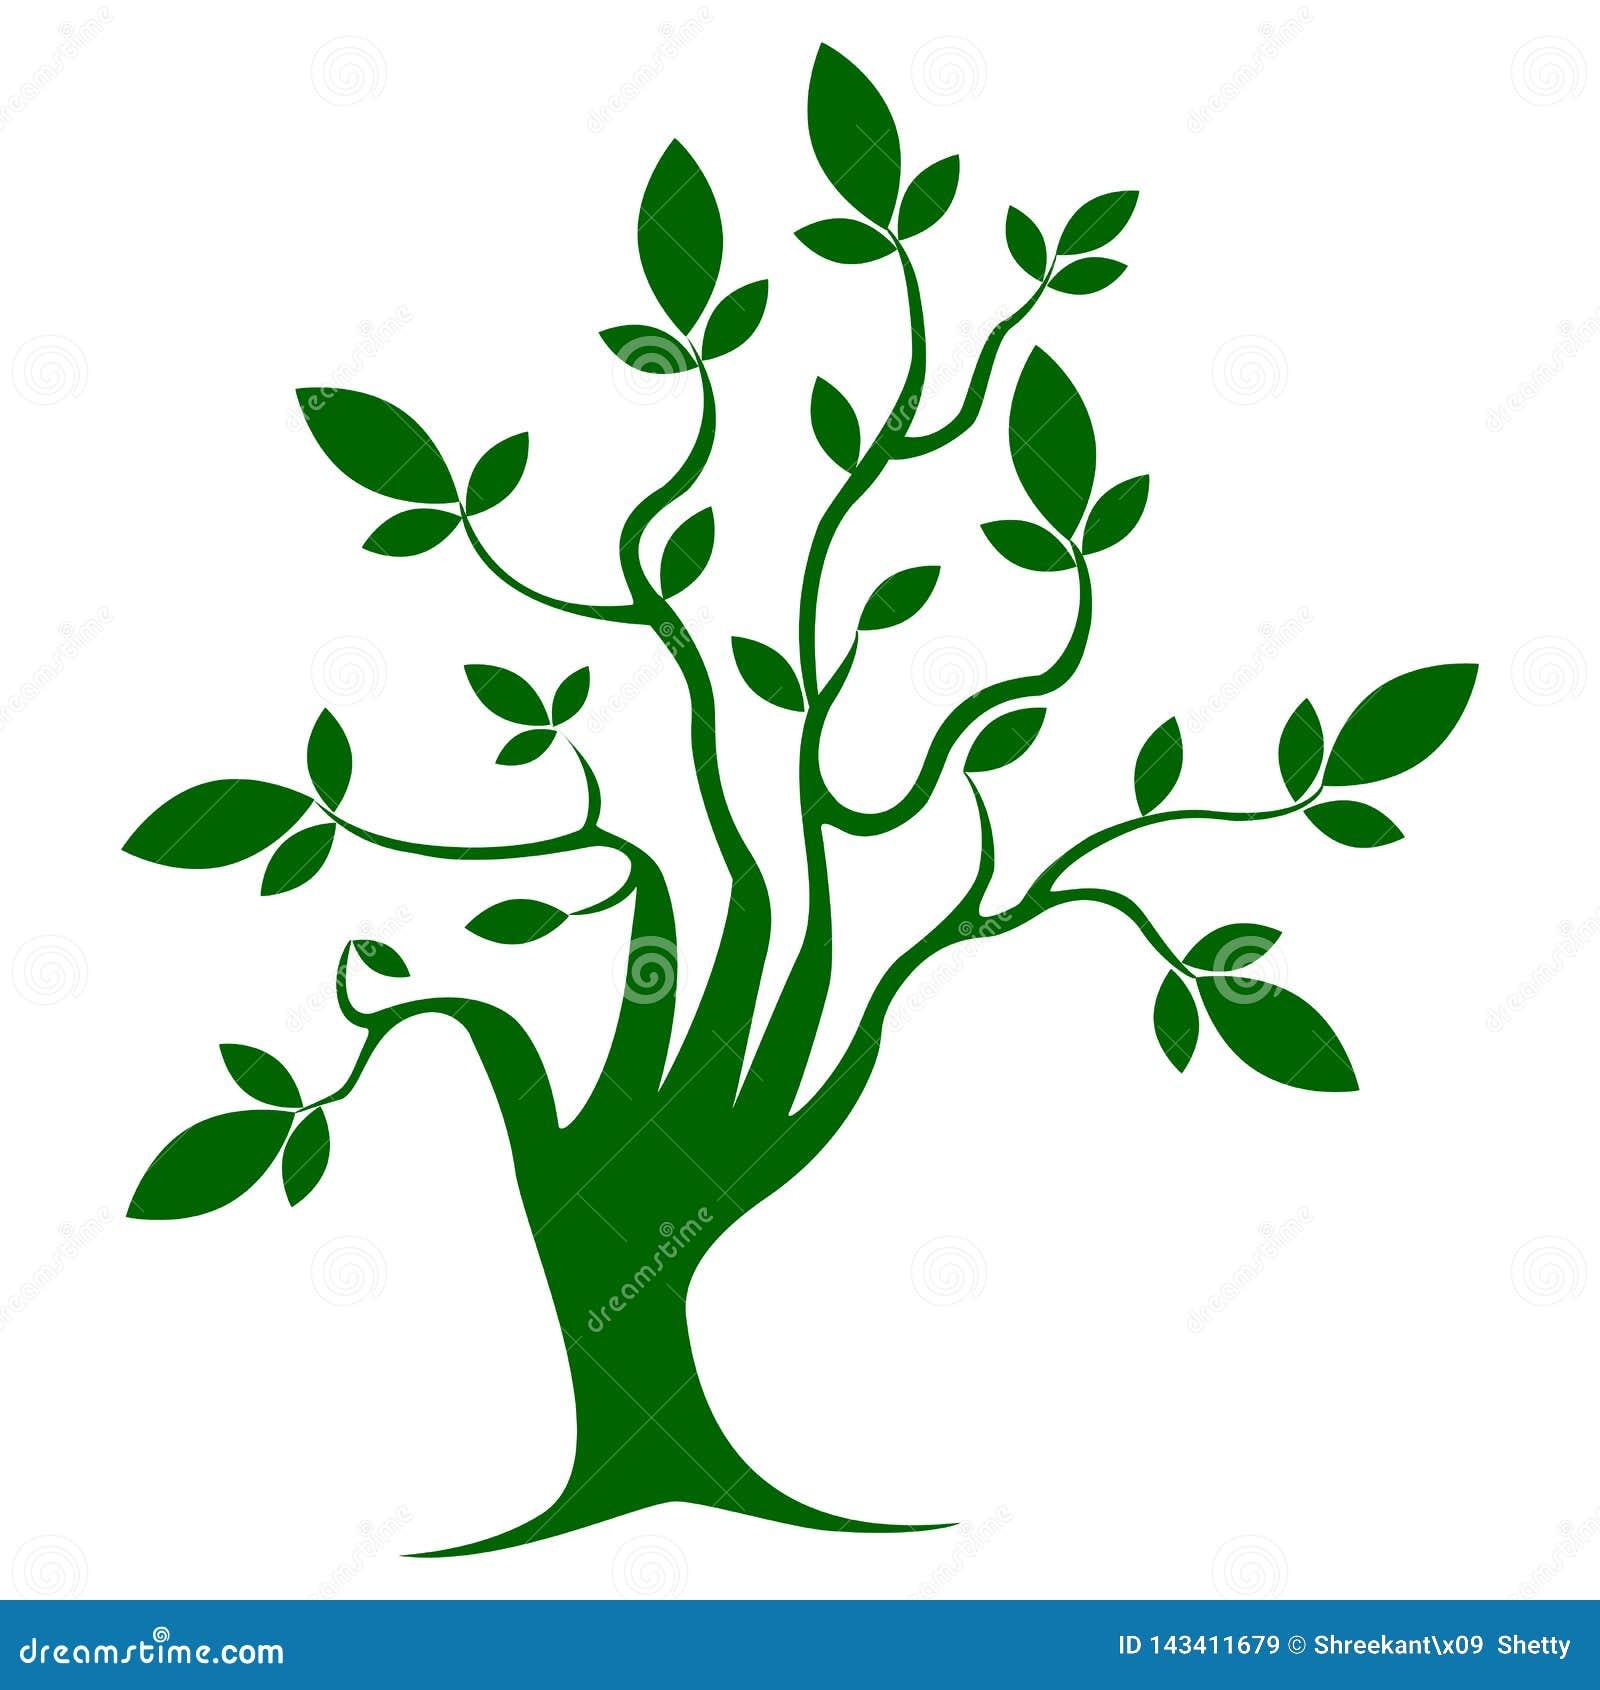 Дерево зеленого цвета, шаблон, символ, рост